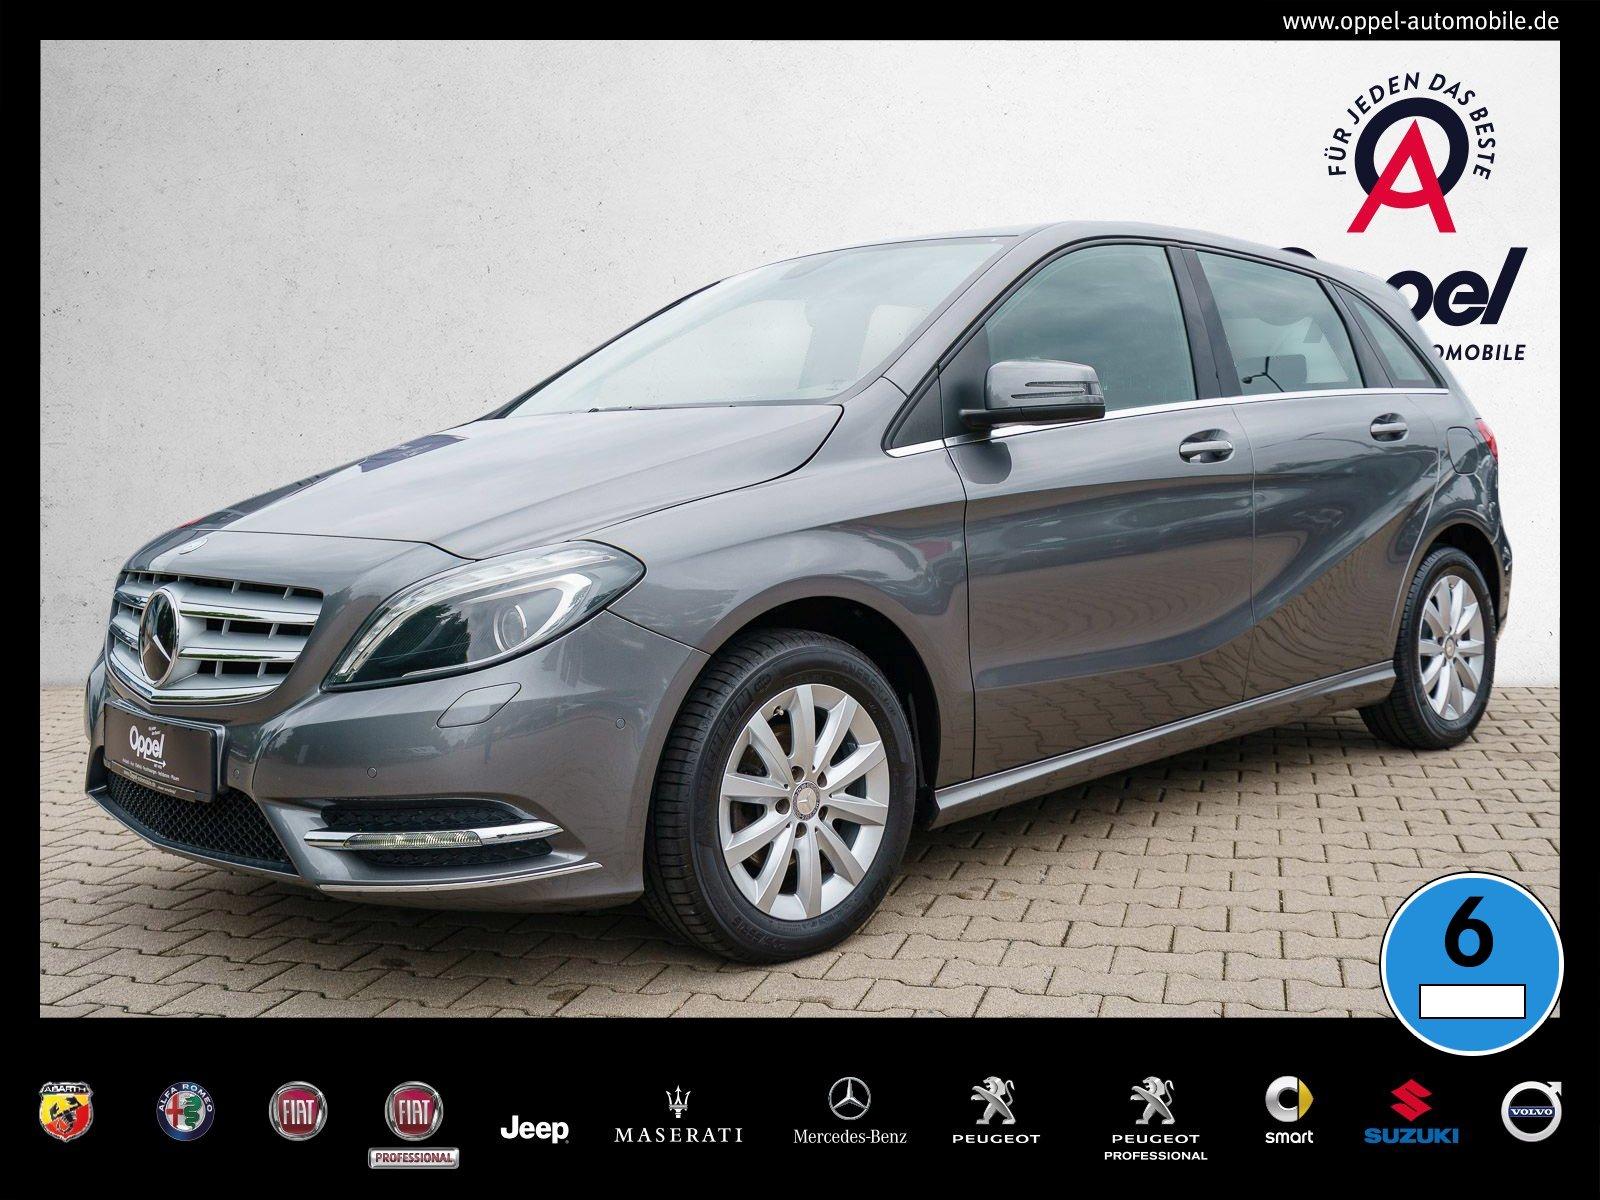 Mercedes-Benz B 180 Blue Efficiency KLIMA+SITZH+TEMPOMAT+XENON, Jahr 2014, Benzin